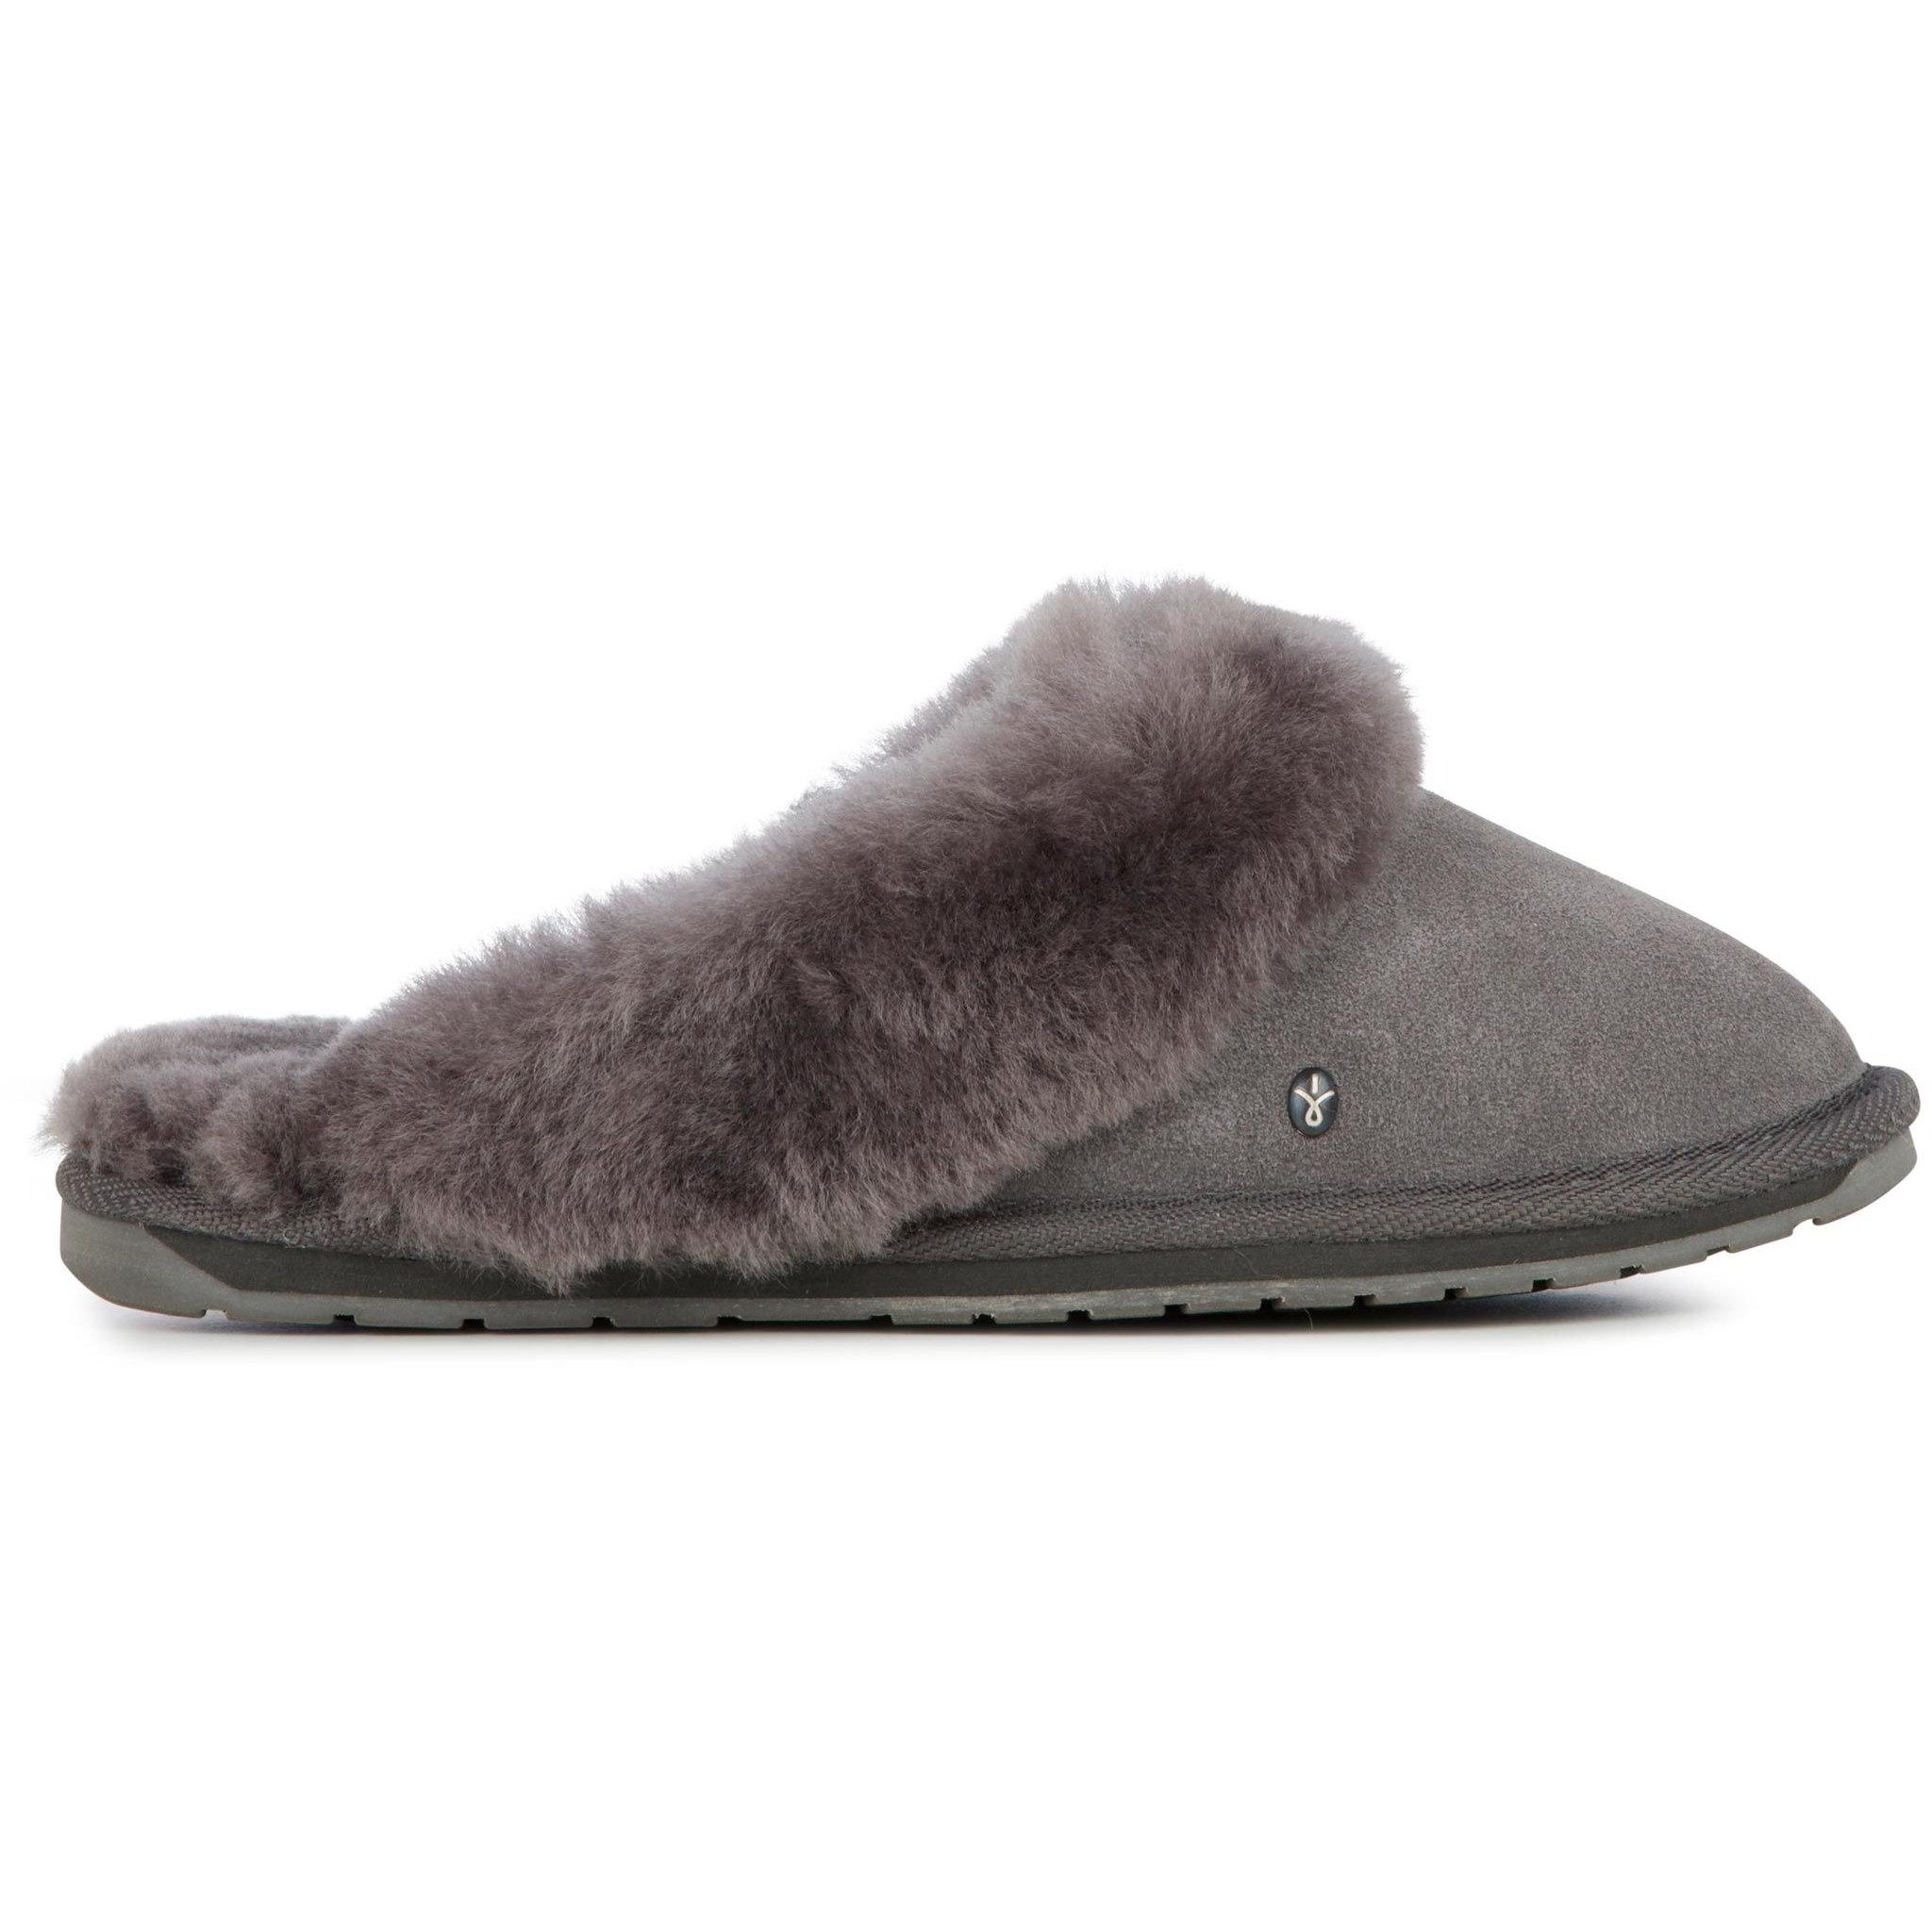 EMU Australia Womens Jolie Sheepskin Slippers - Charcoal